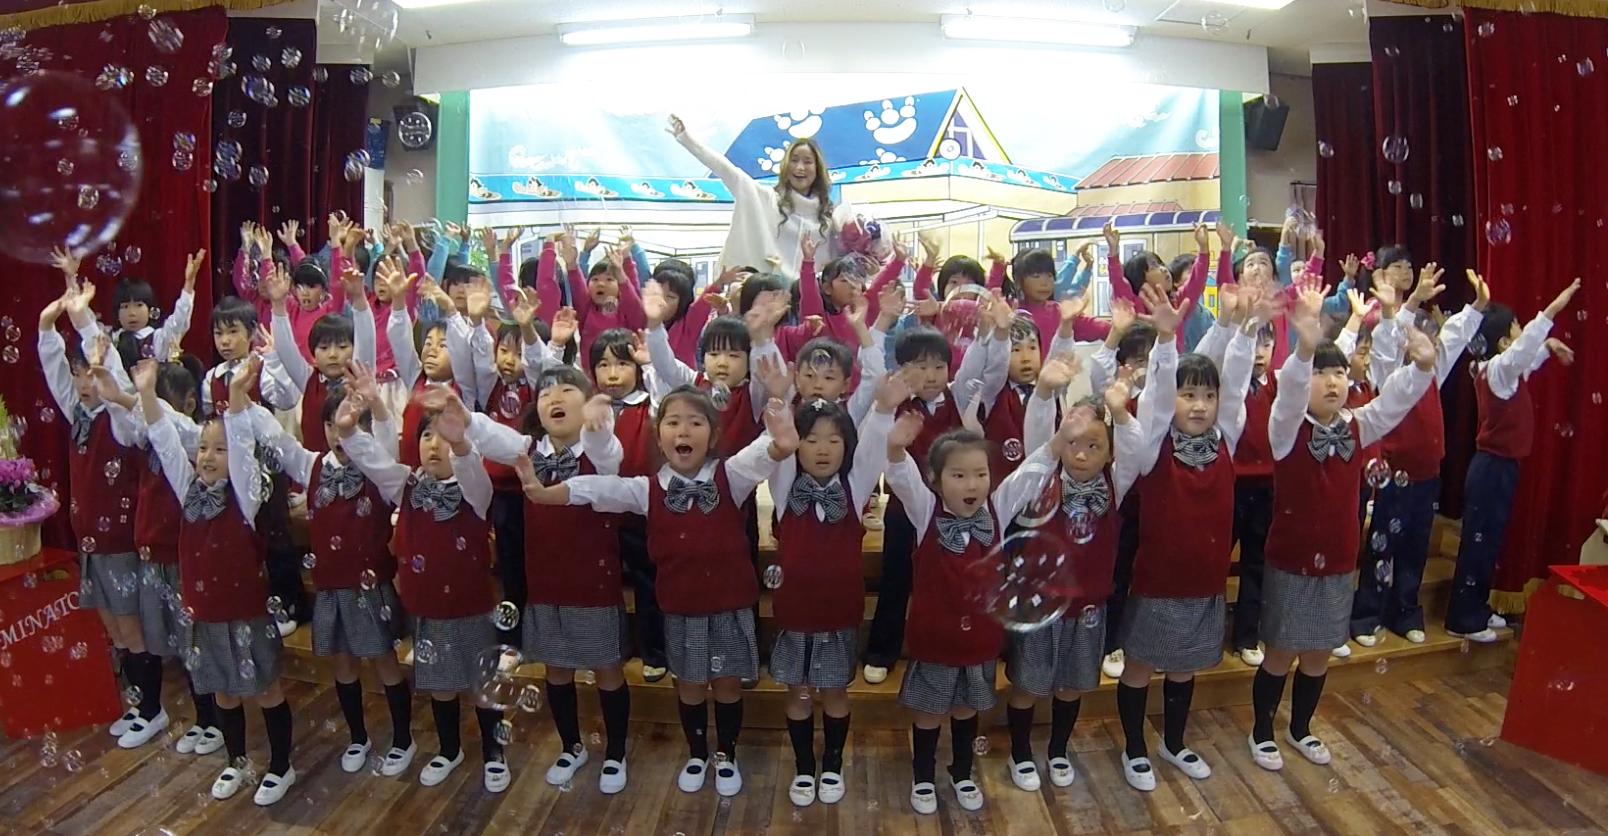 my-dream-song-minato-preschool-10.jpg